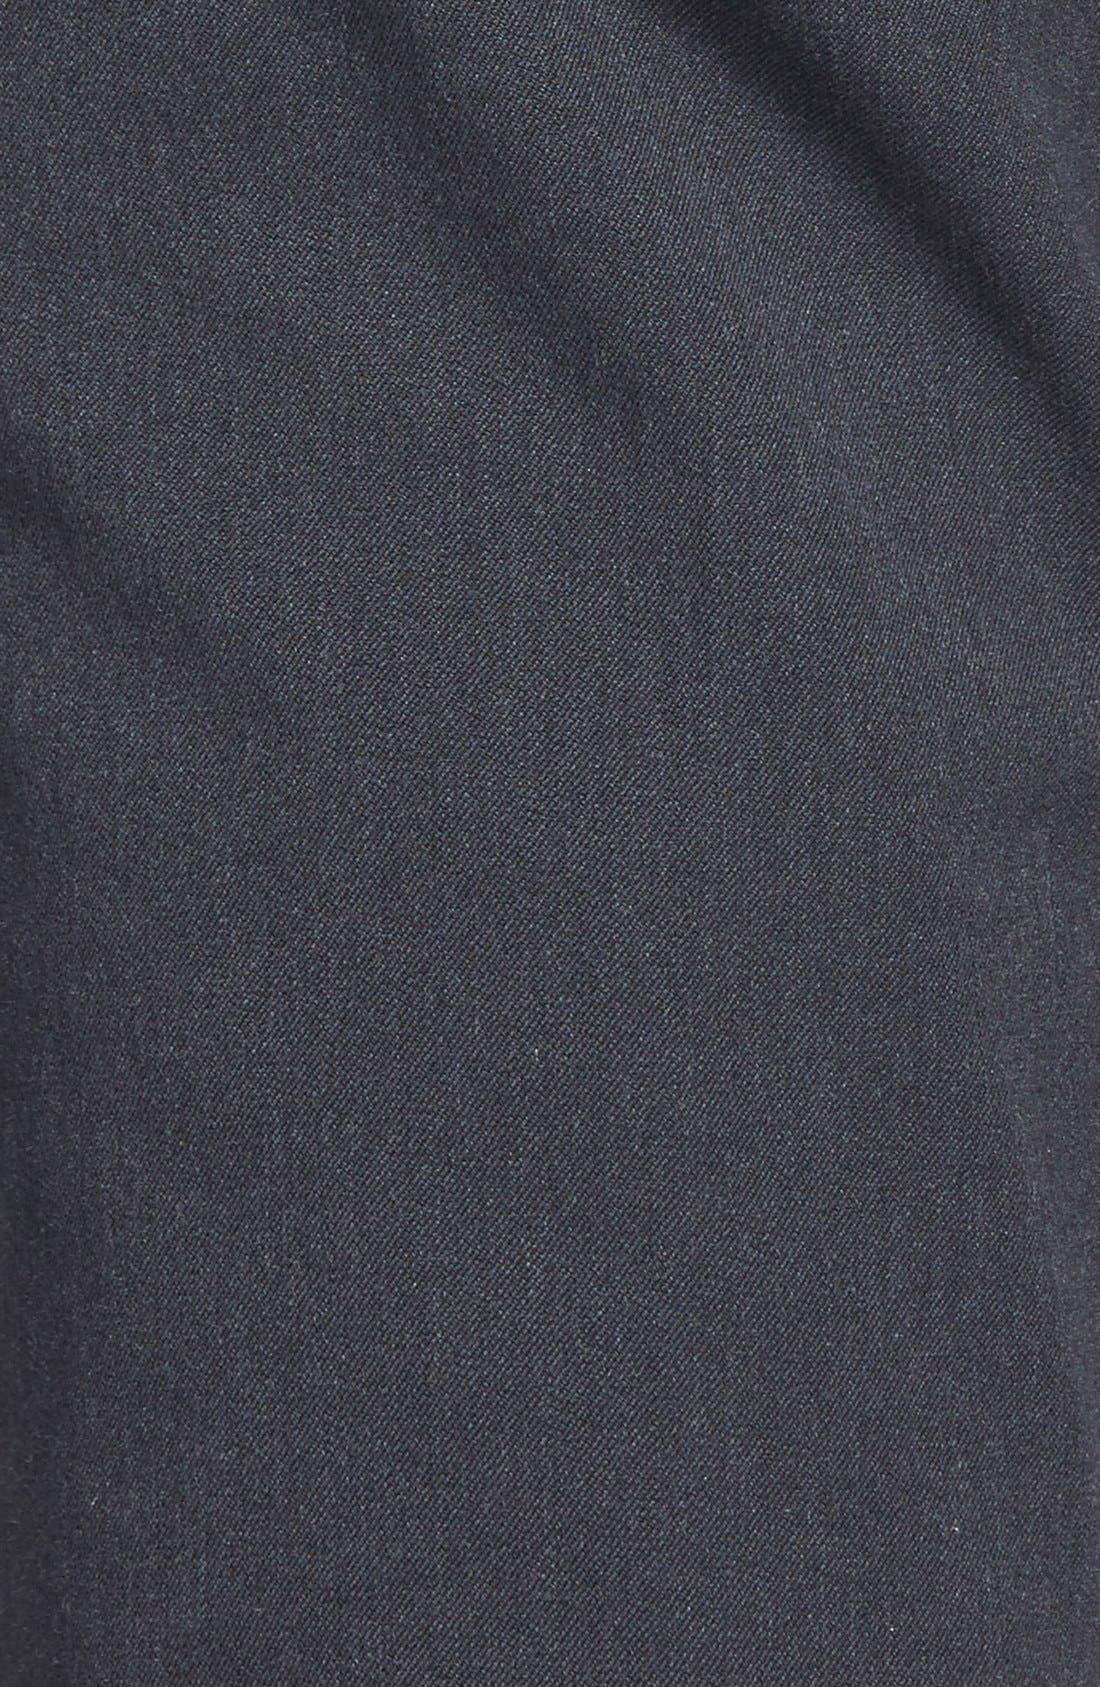 'Dantey' Slim Leg Pants,                             Alternate thumbnail 2, color,                             001